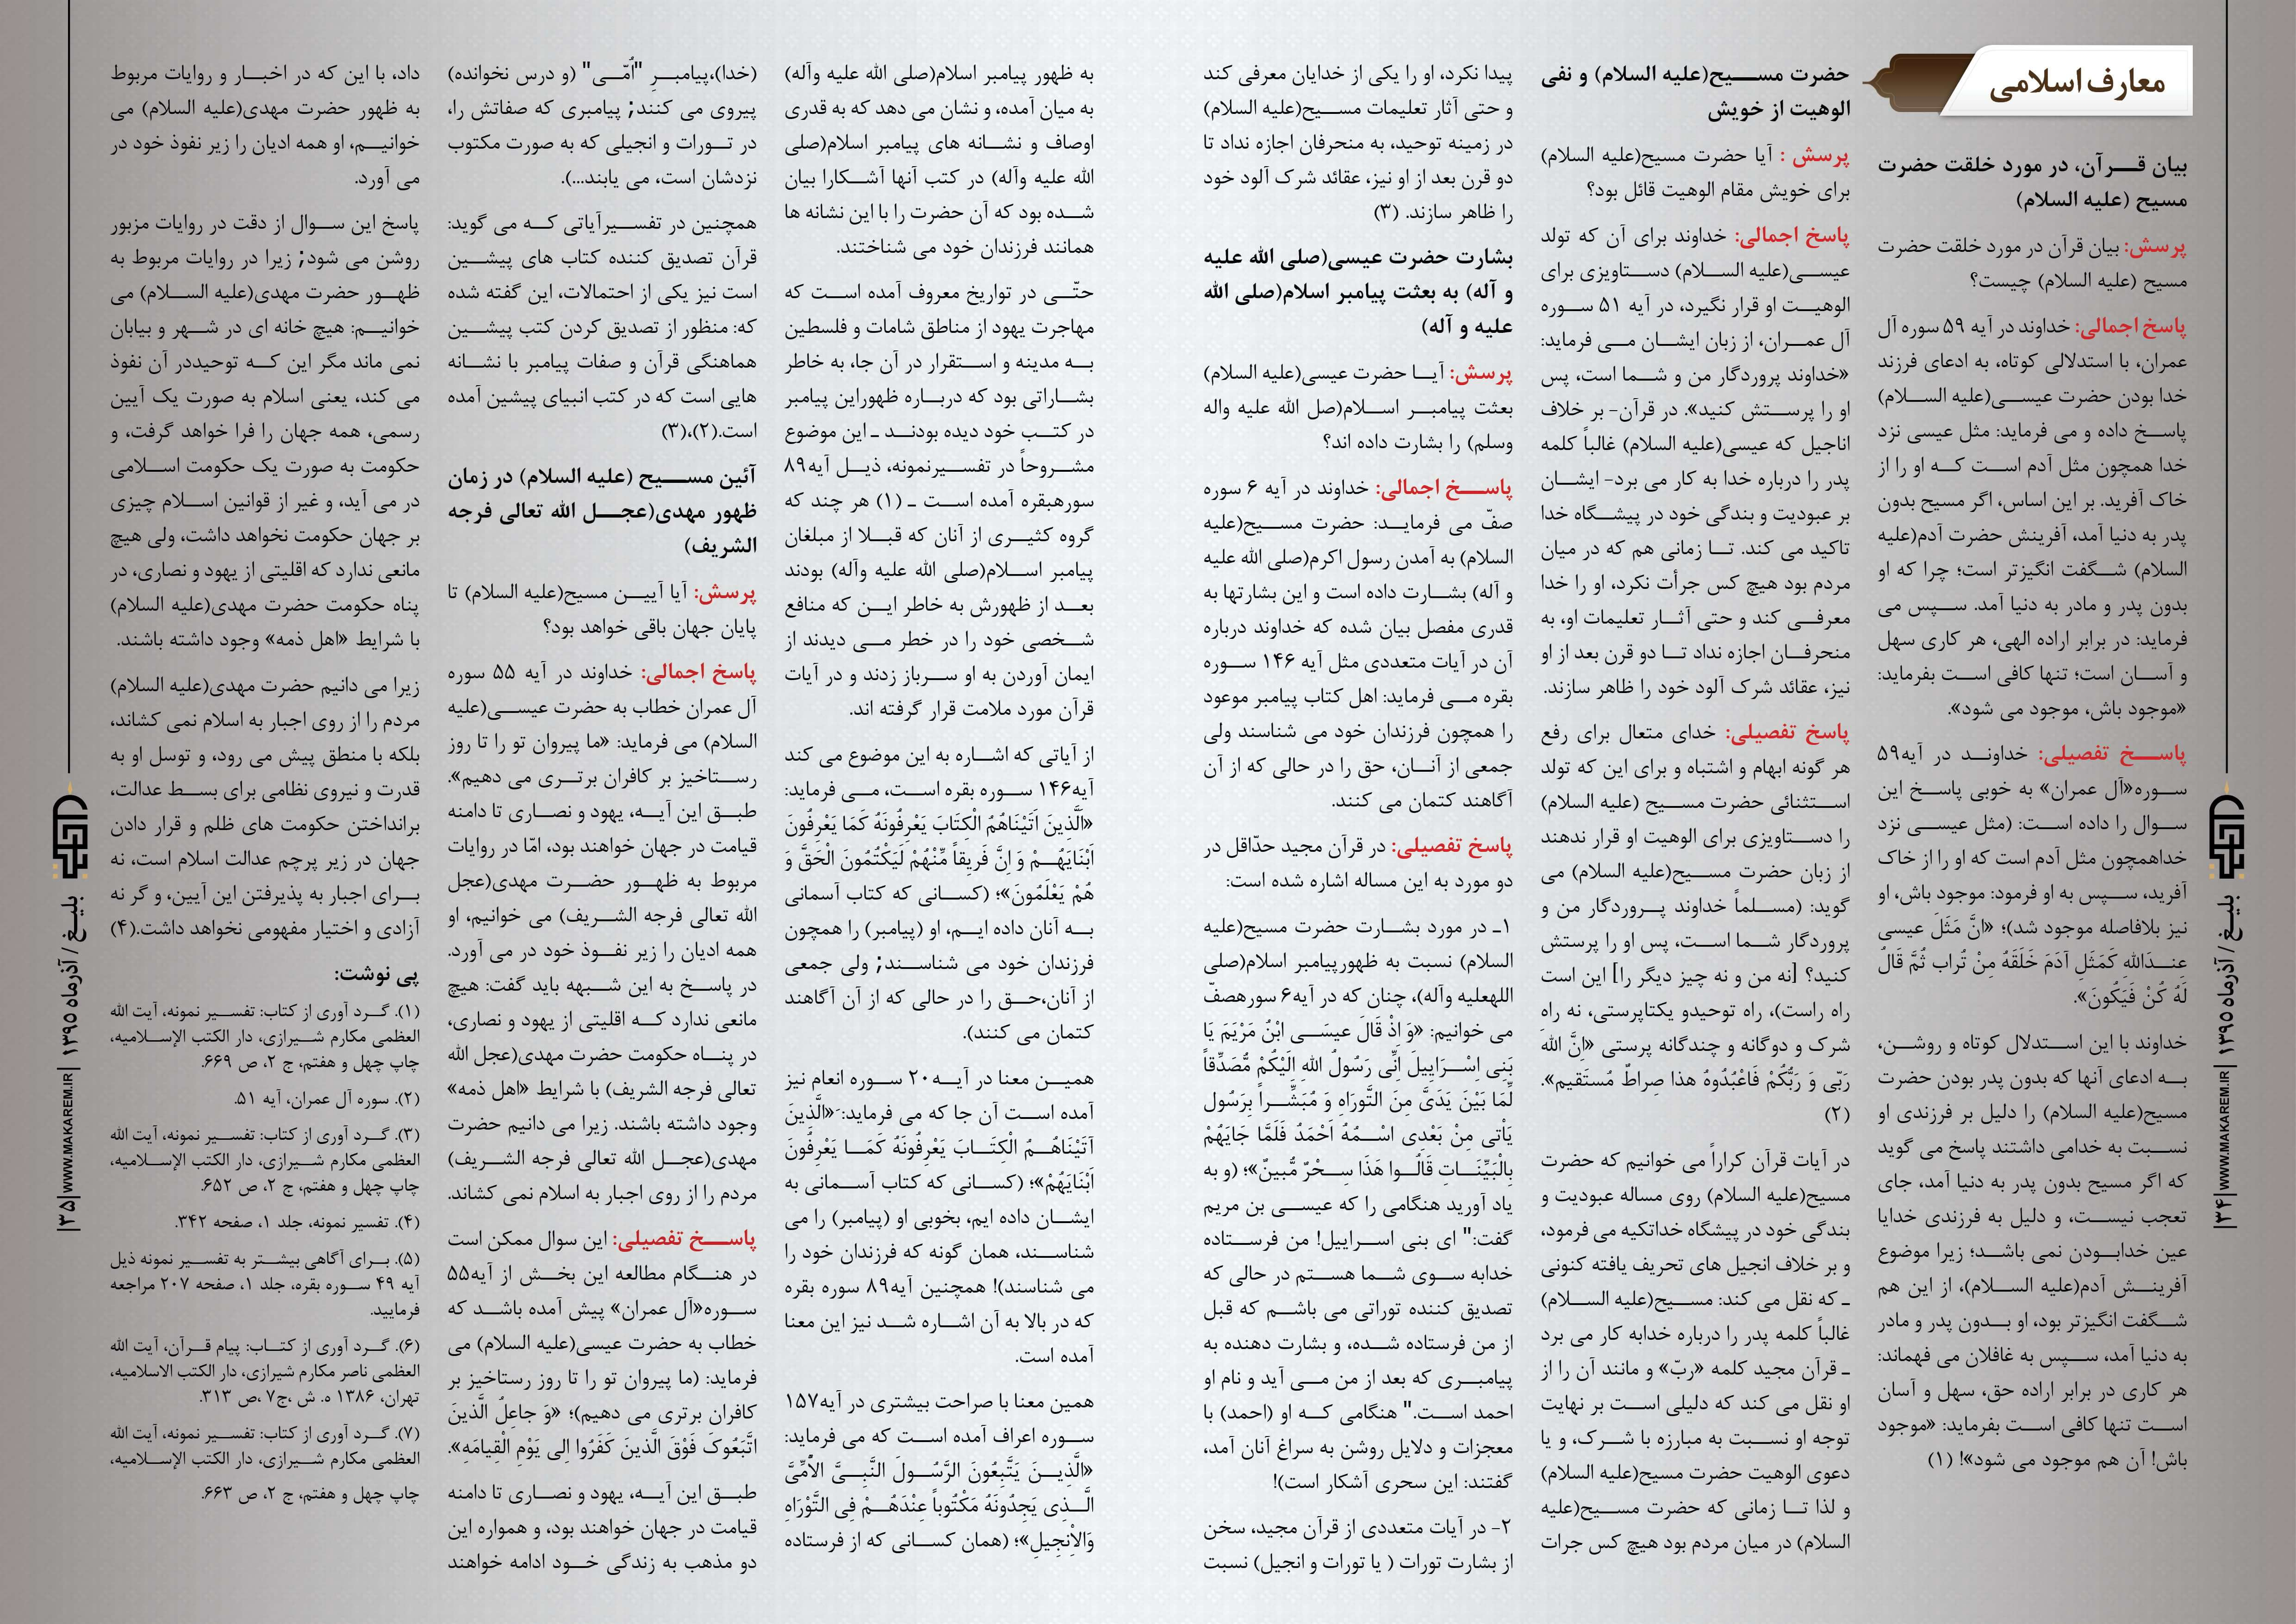 معارف اسلامی-مدرسه الامام امیر المومنین (ع)